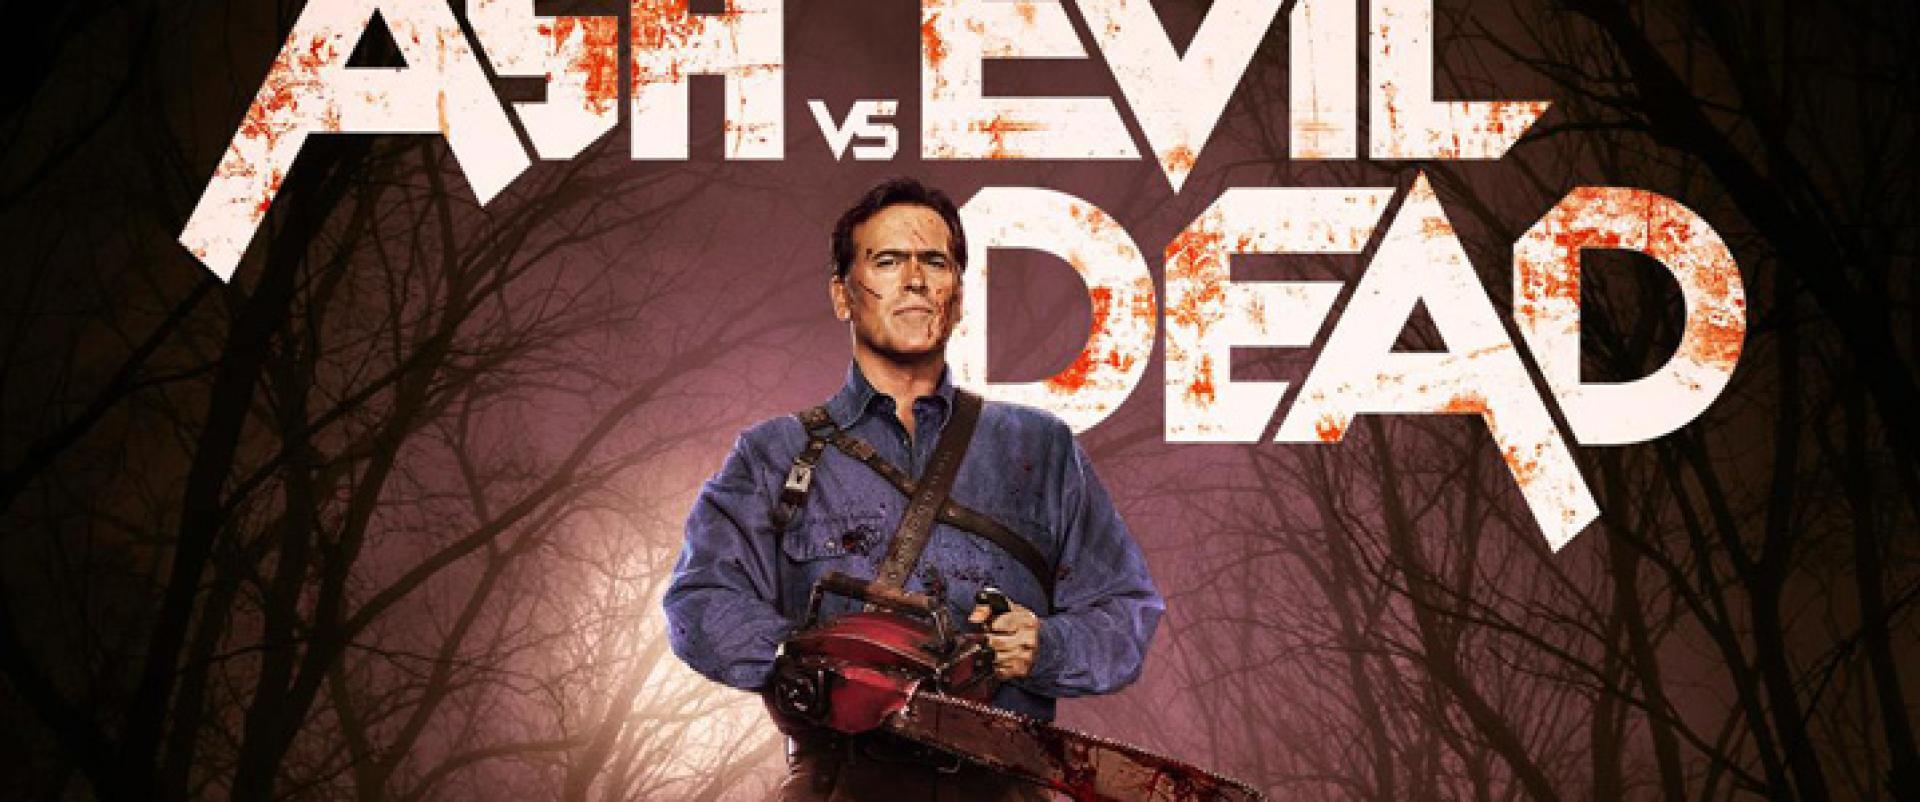 Ash vs. Evil Dead: hivatalos poszter